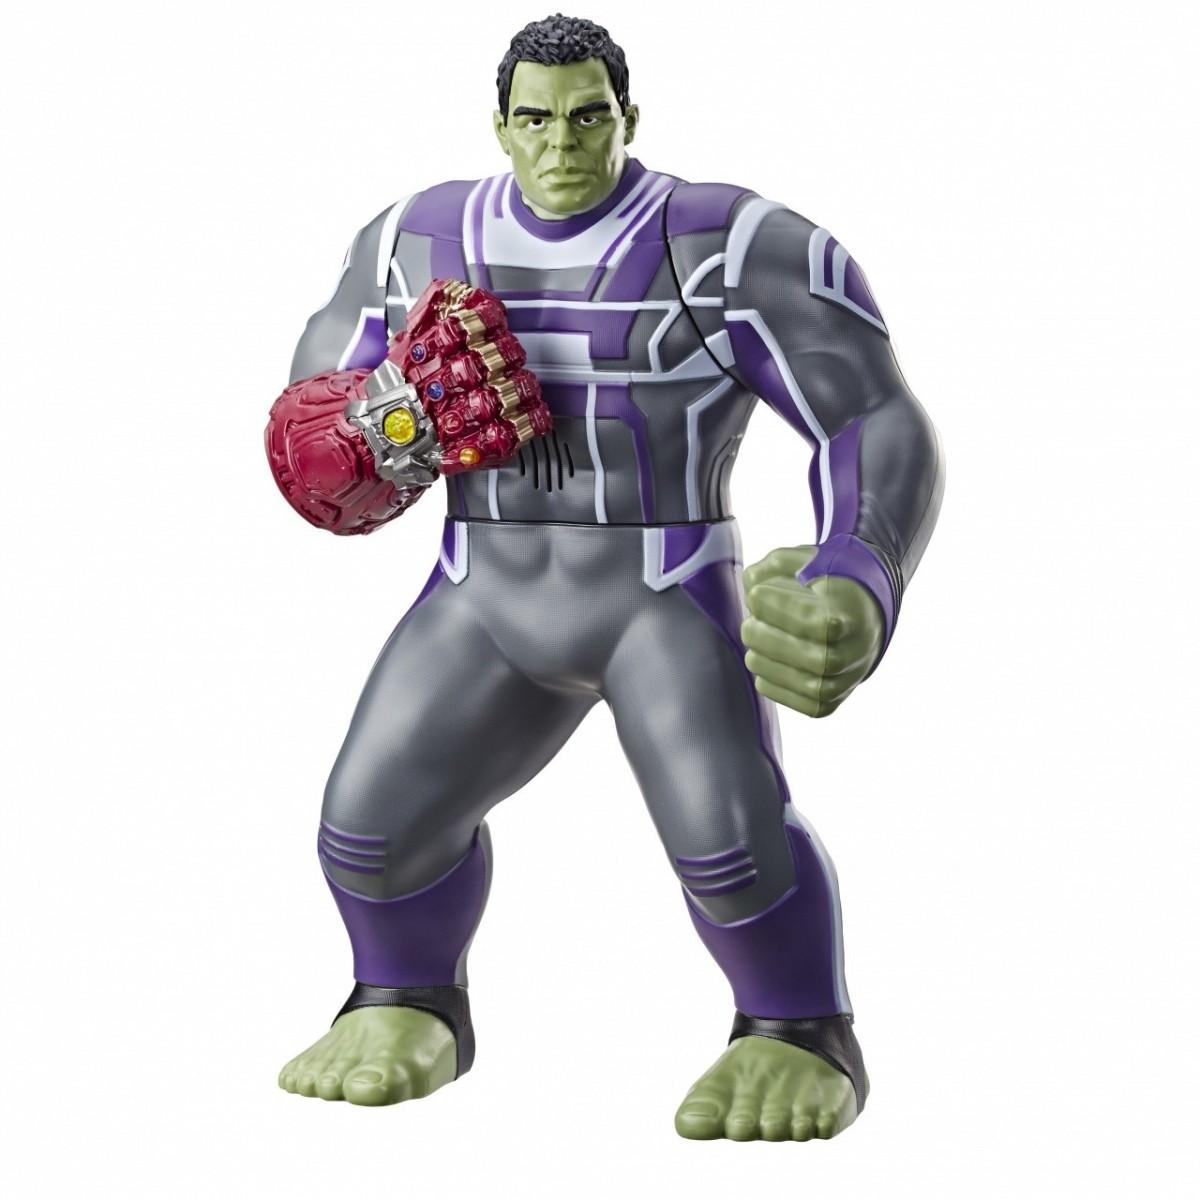 Avengers AOU Hulk Rampaging personaggio 11cm Hasbro 2015